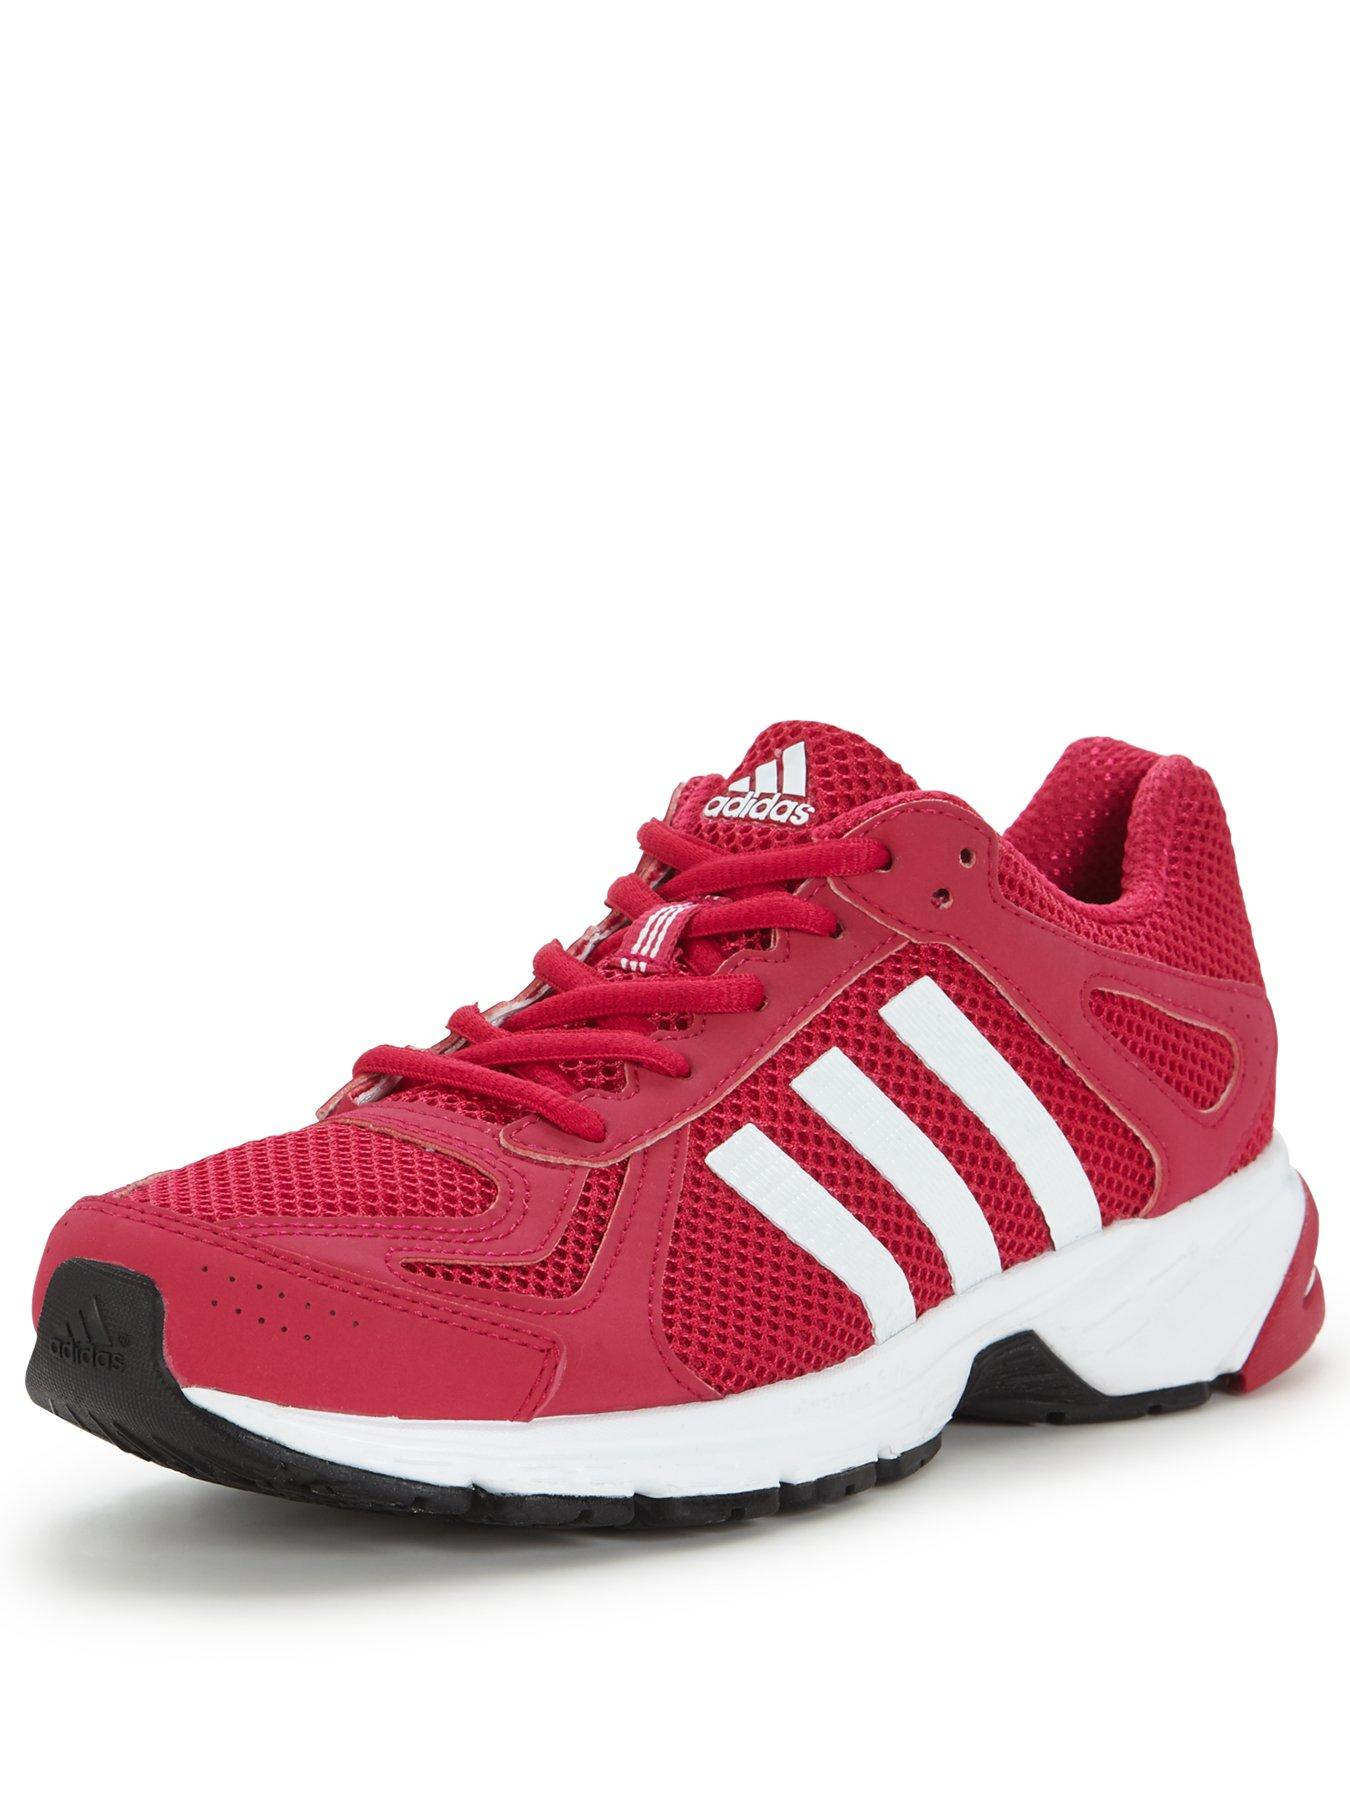 adidas gazelle sports direct